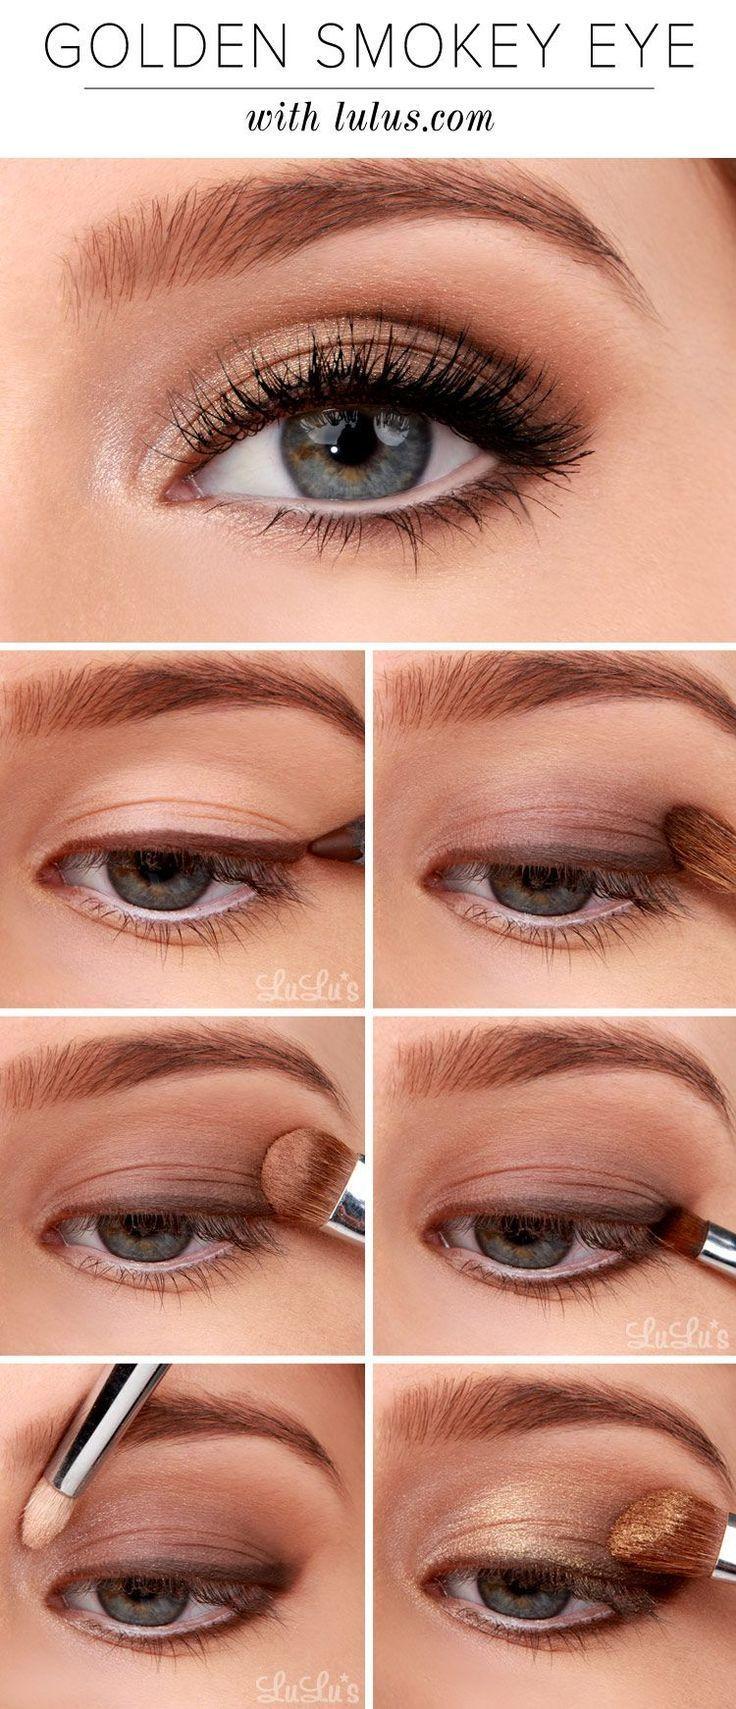 10 Tutorials to Make Flawless Eyeliners